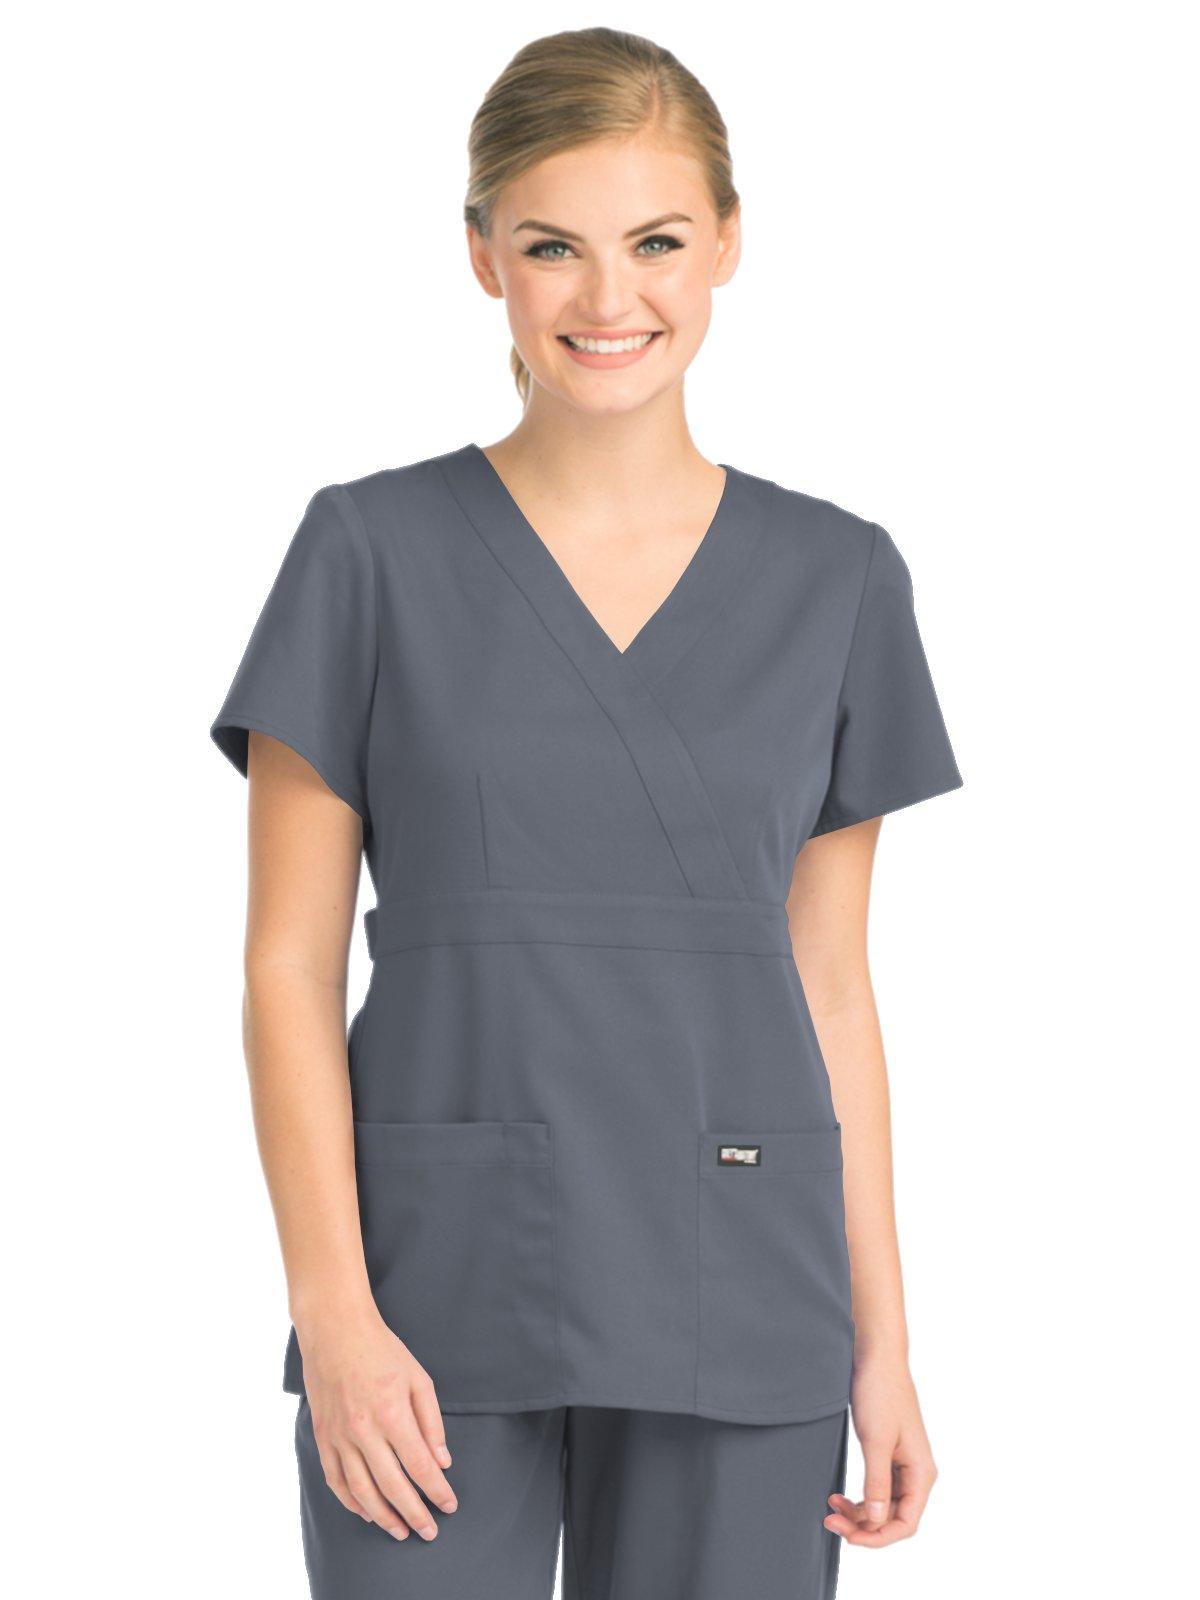 Grey's Anatomy 4153 Women's Mock Wrap Top Granite L